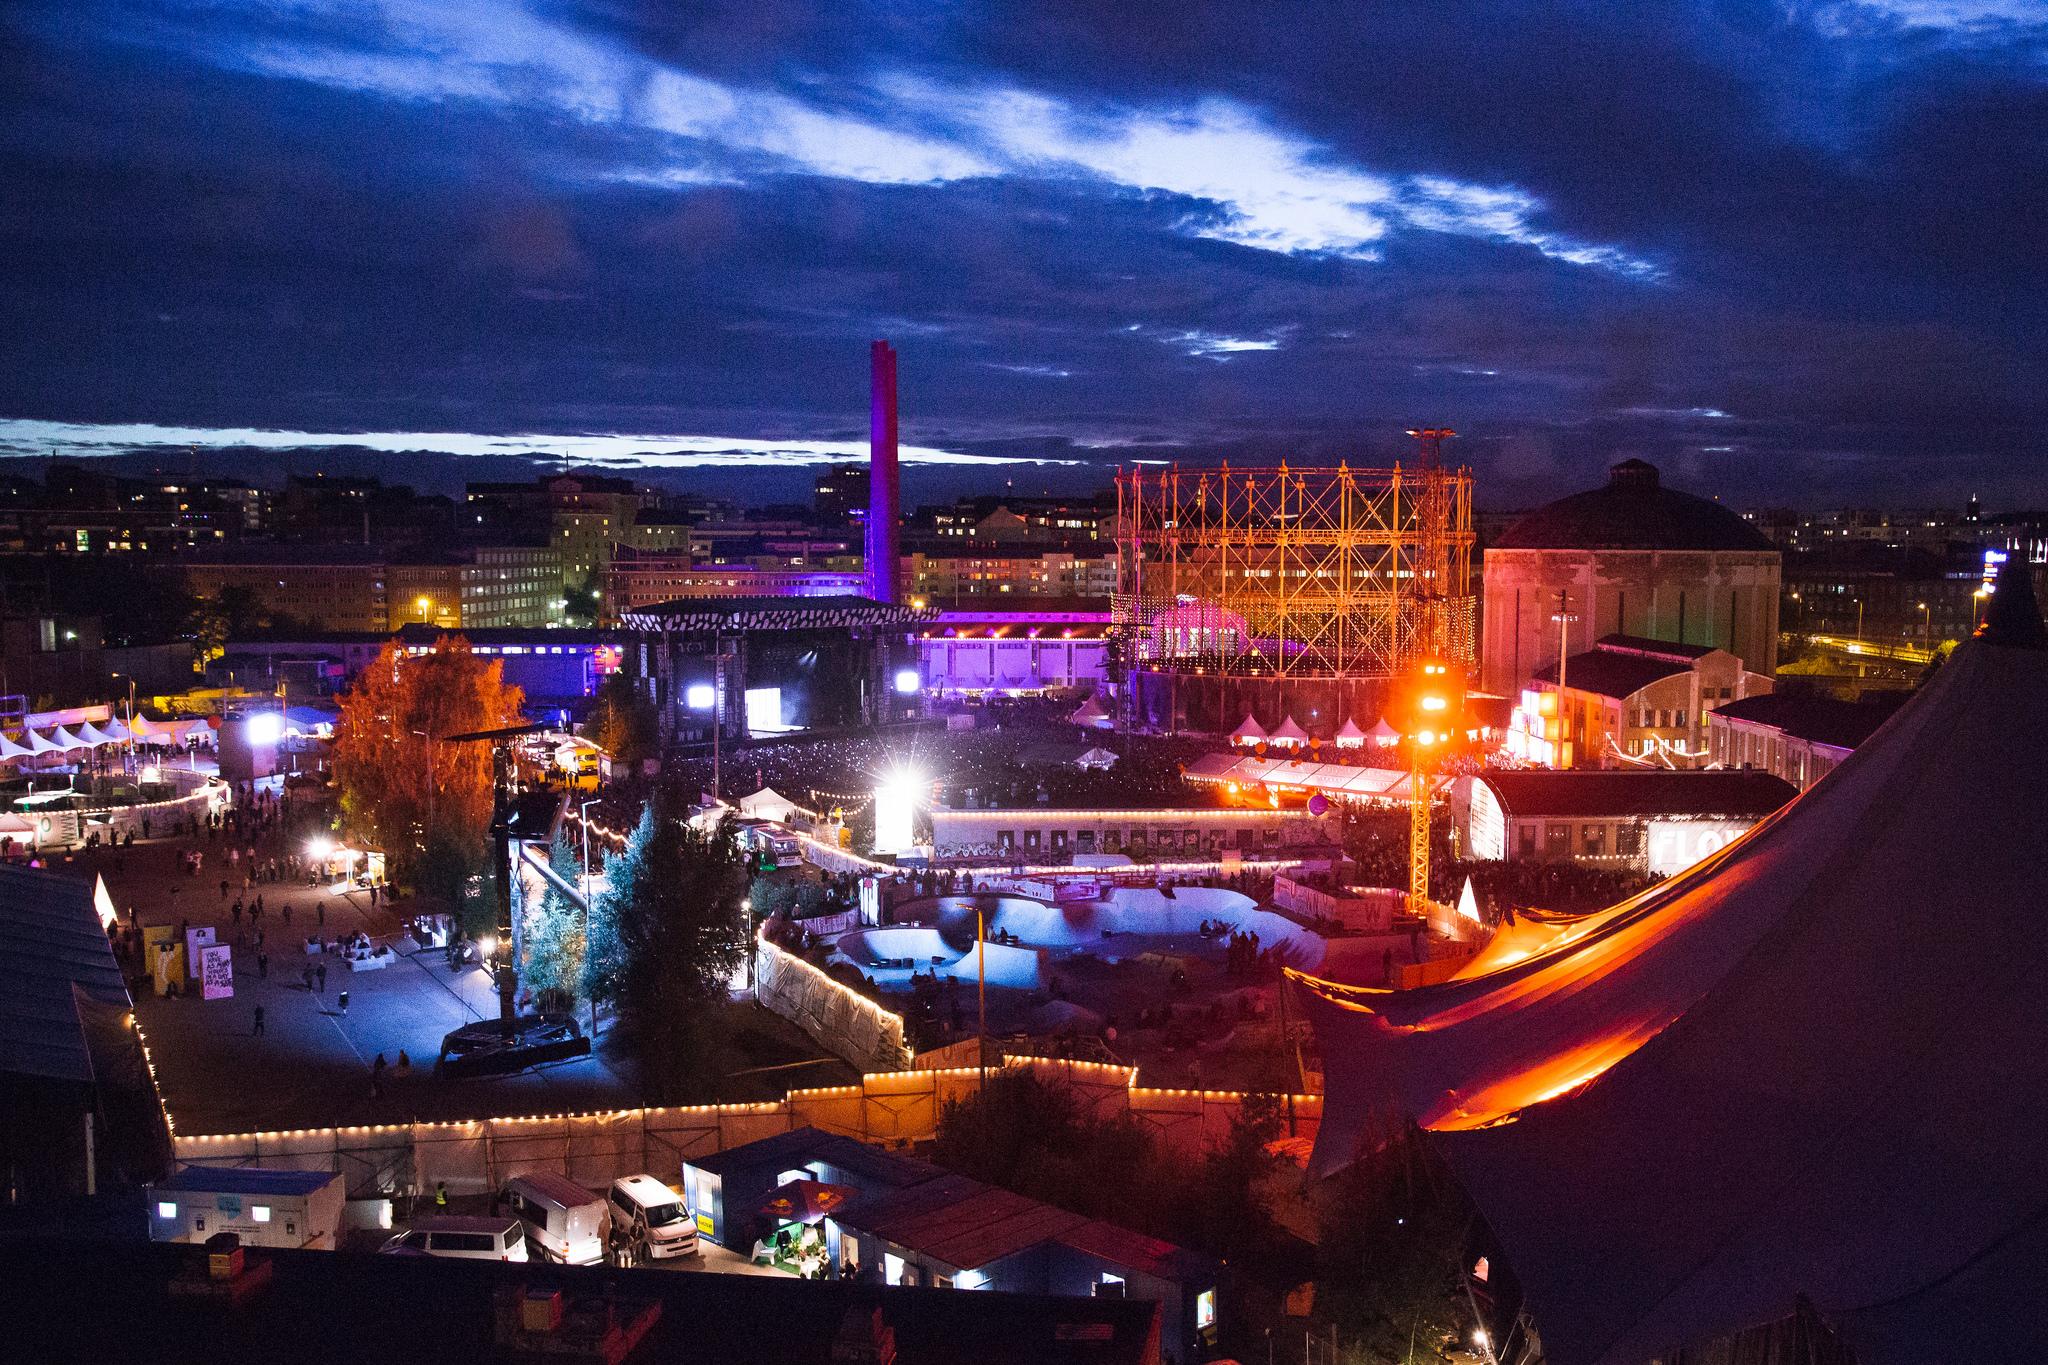 The Kallio and Sörnäinen Helsinki cityscape surrounding the urban hipster event Flow Festival